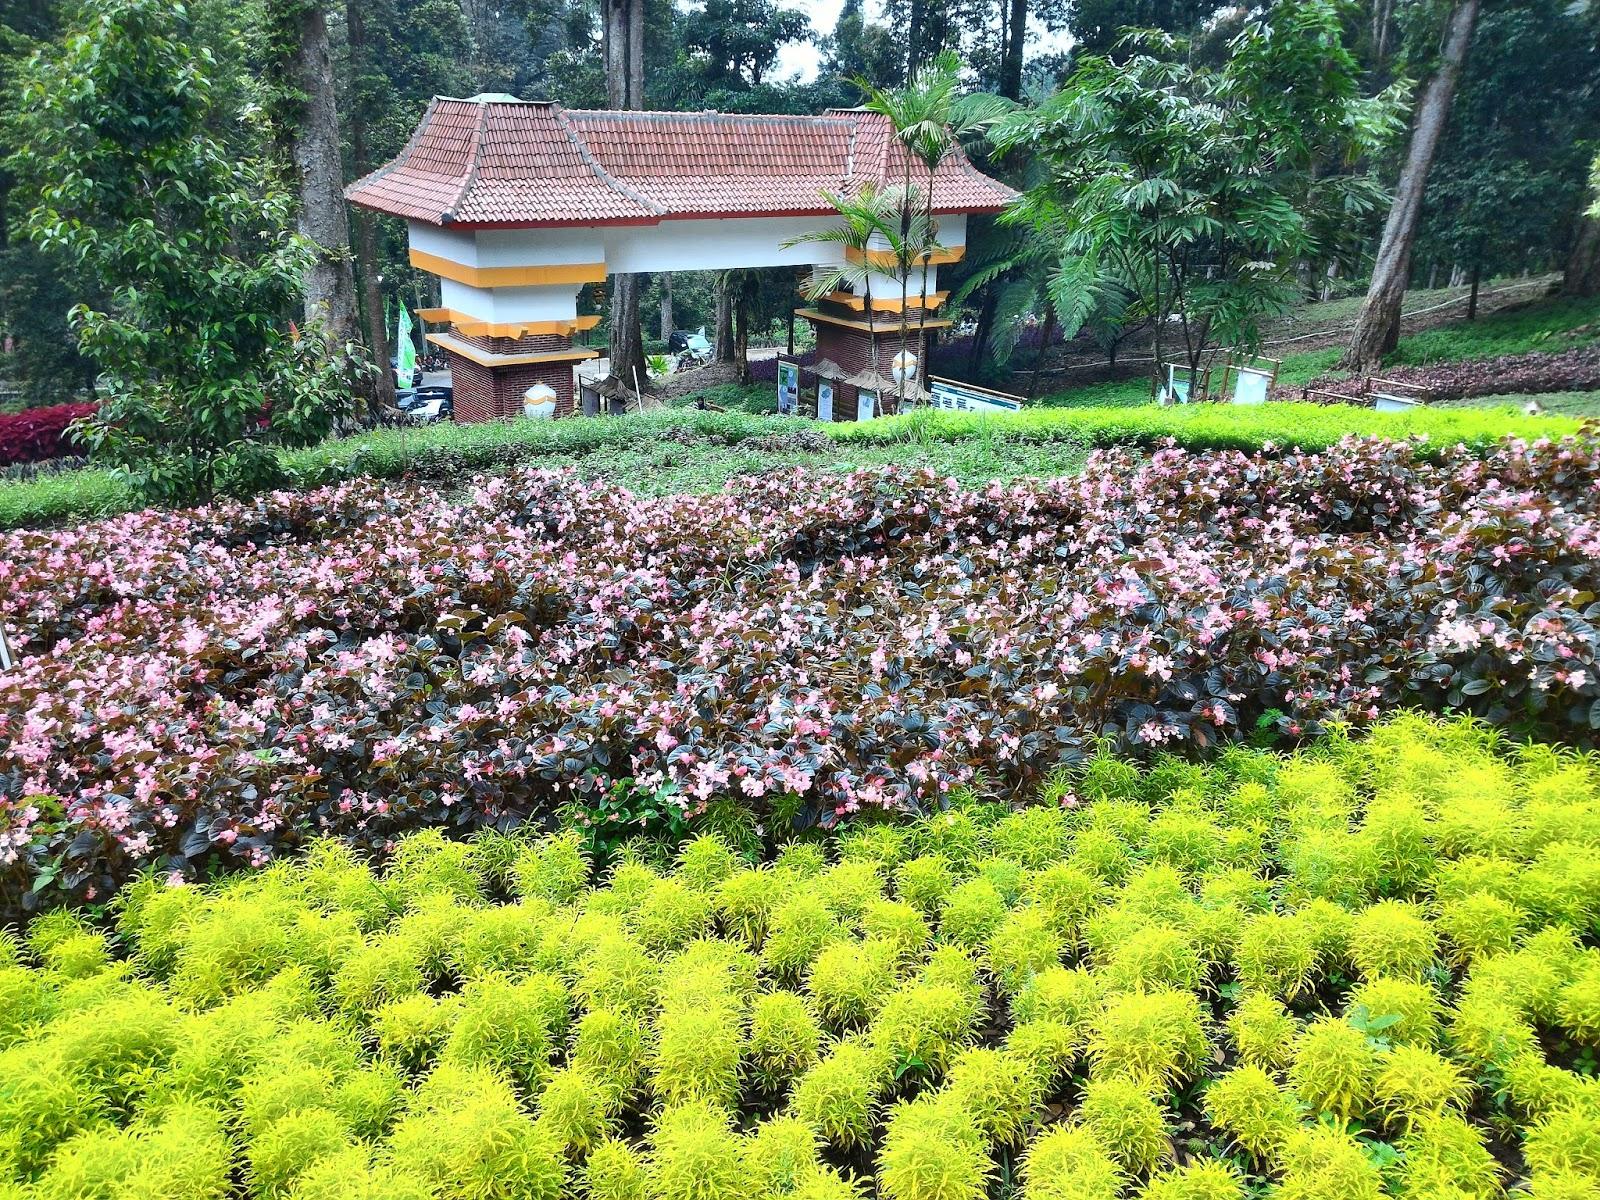 Jalan2 Yuk Kebun Raya Baturaden Purwokerto Jawa Tengah Mungkin Kurang